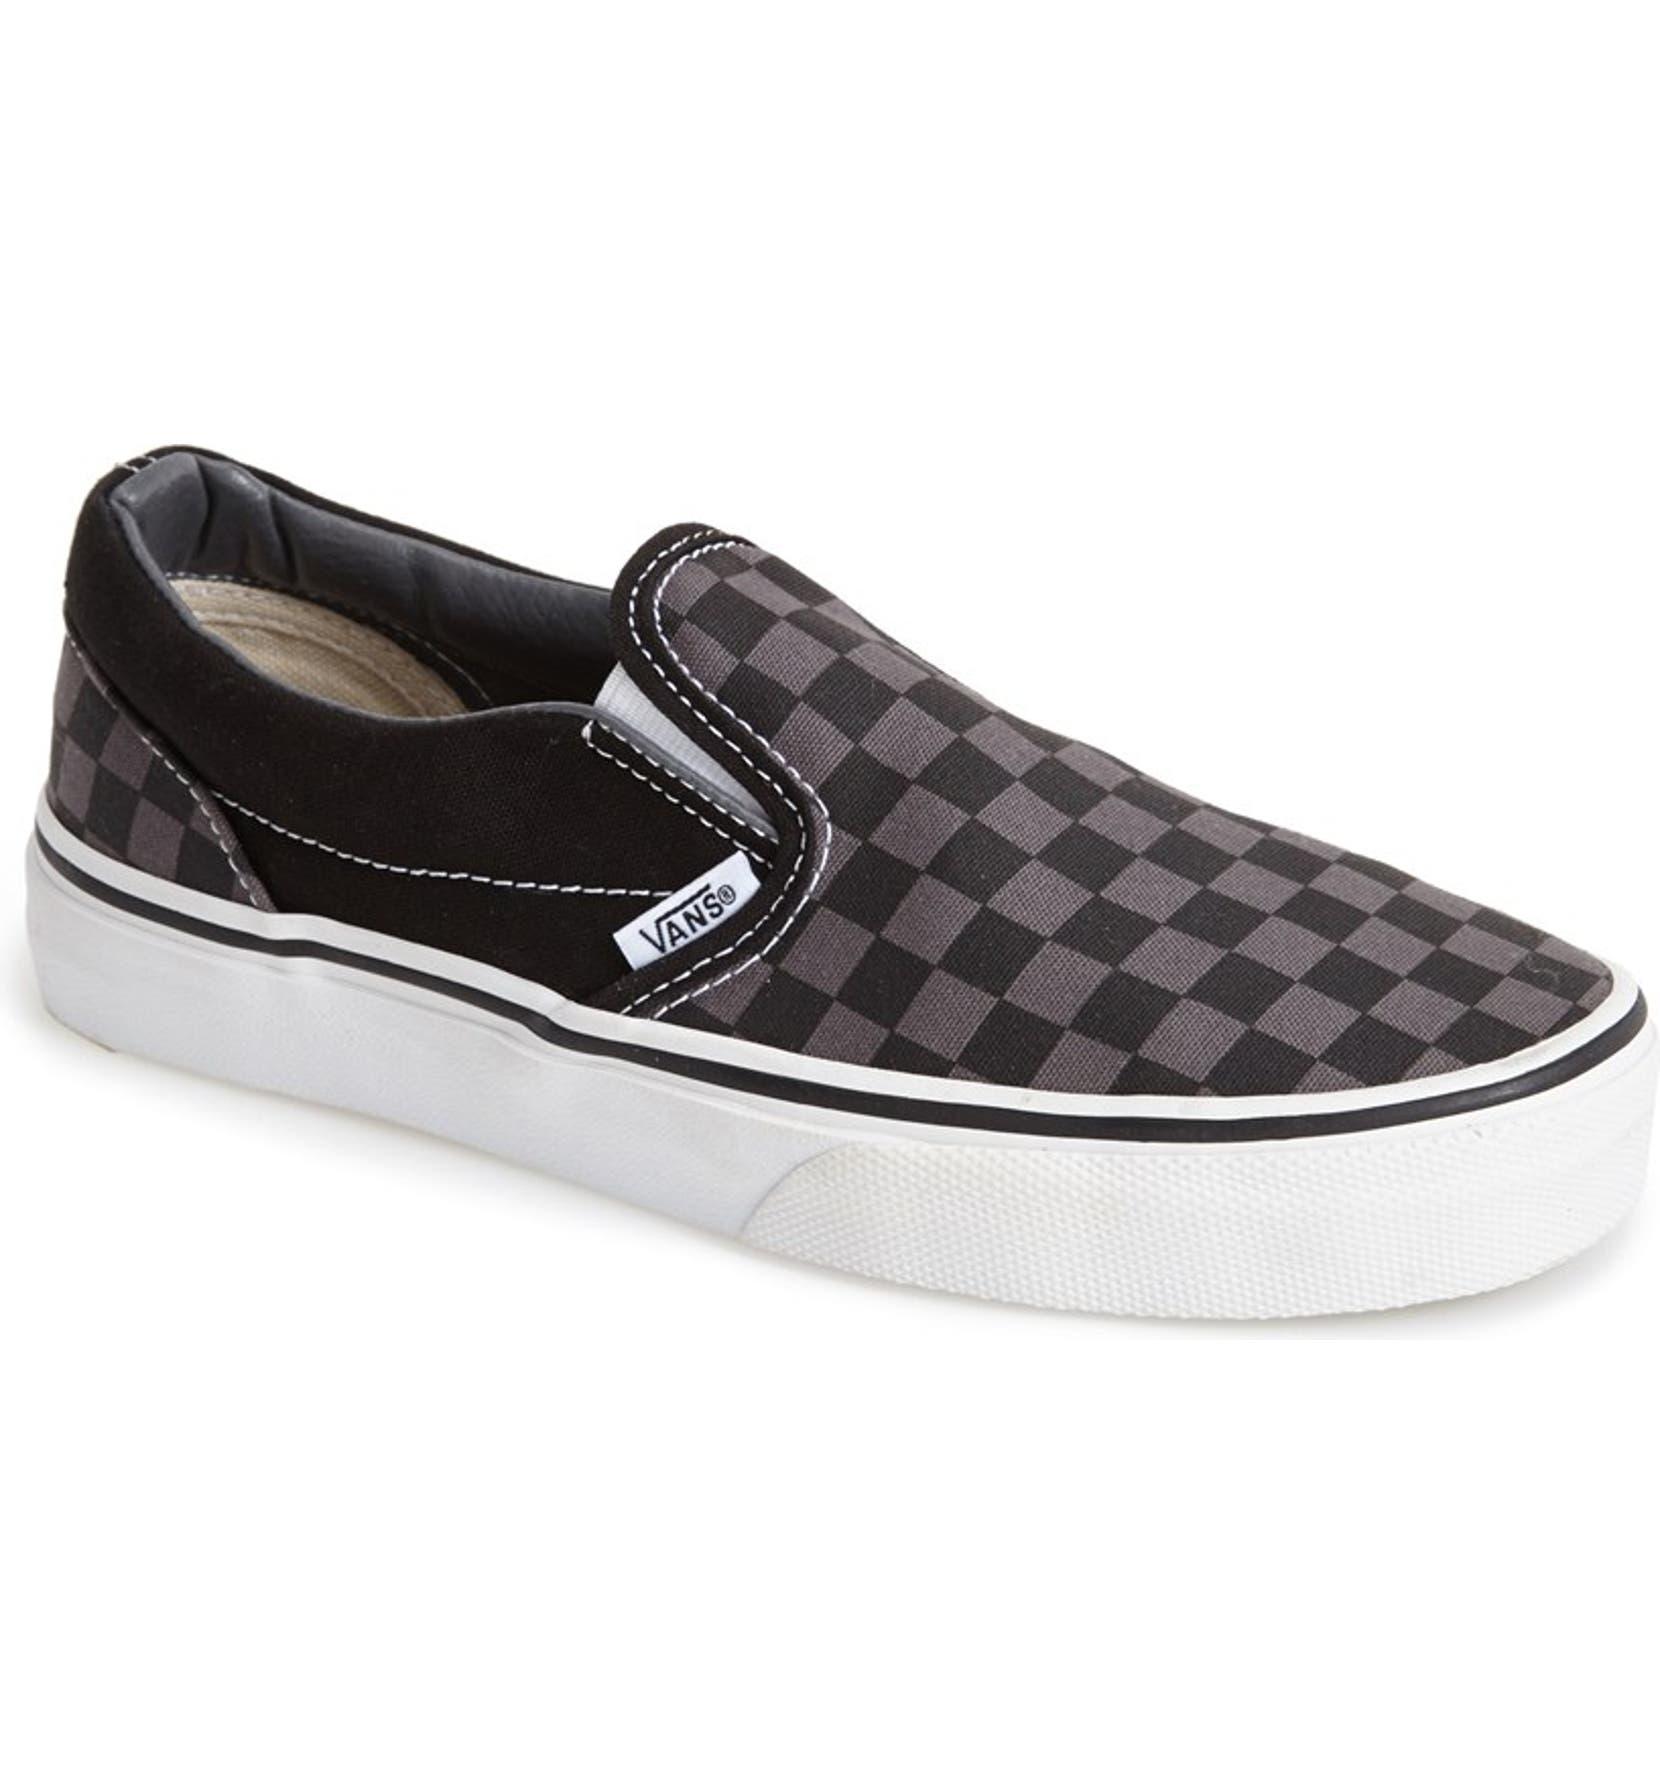 afbdb316163b12 Vans Classic Checker Slip-On (Toddler